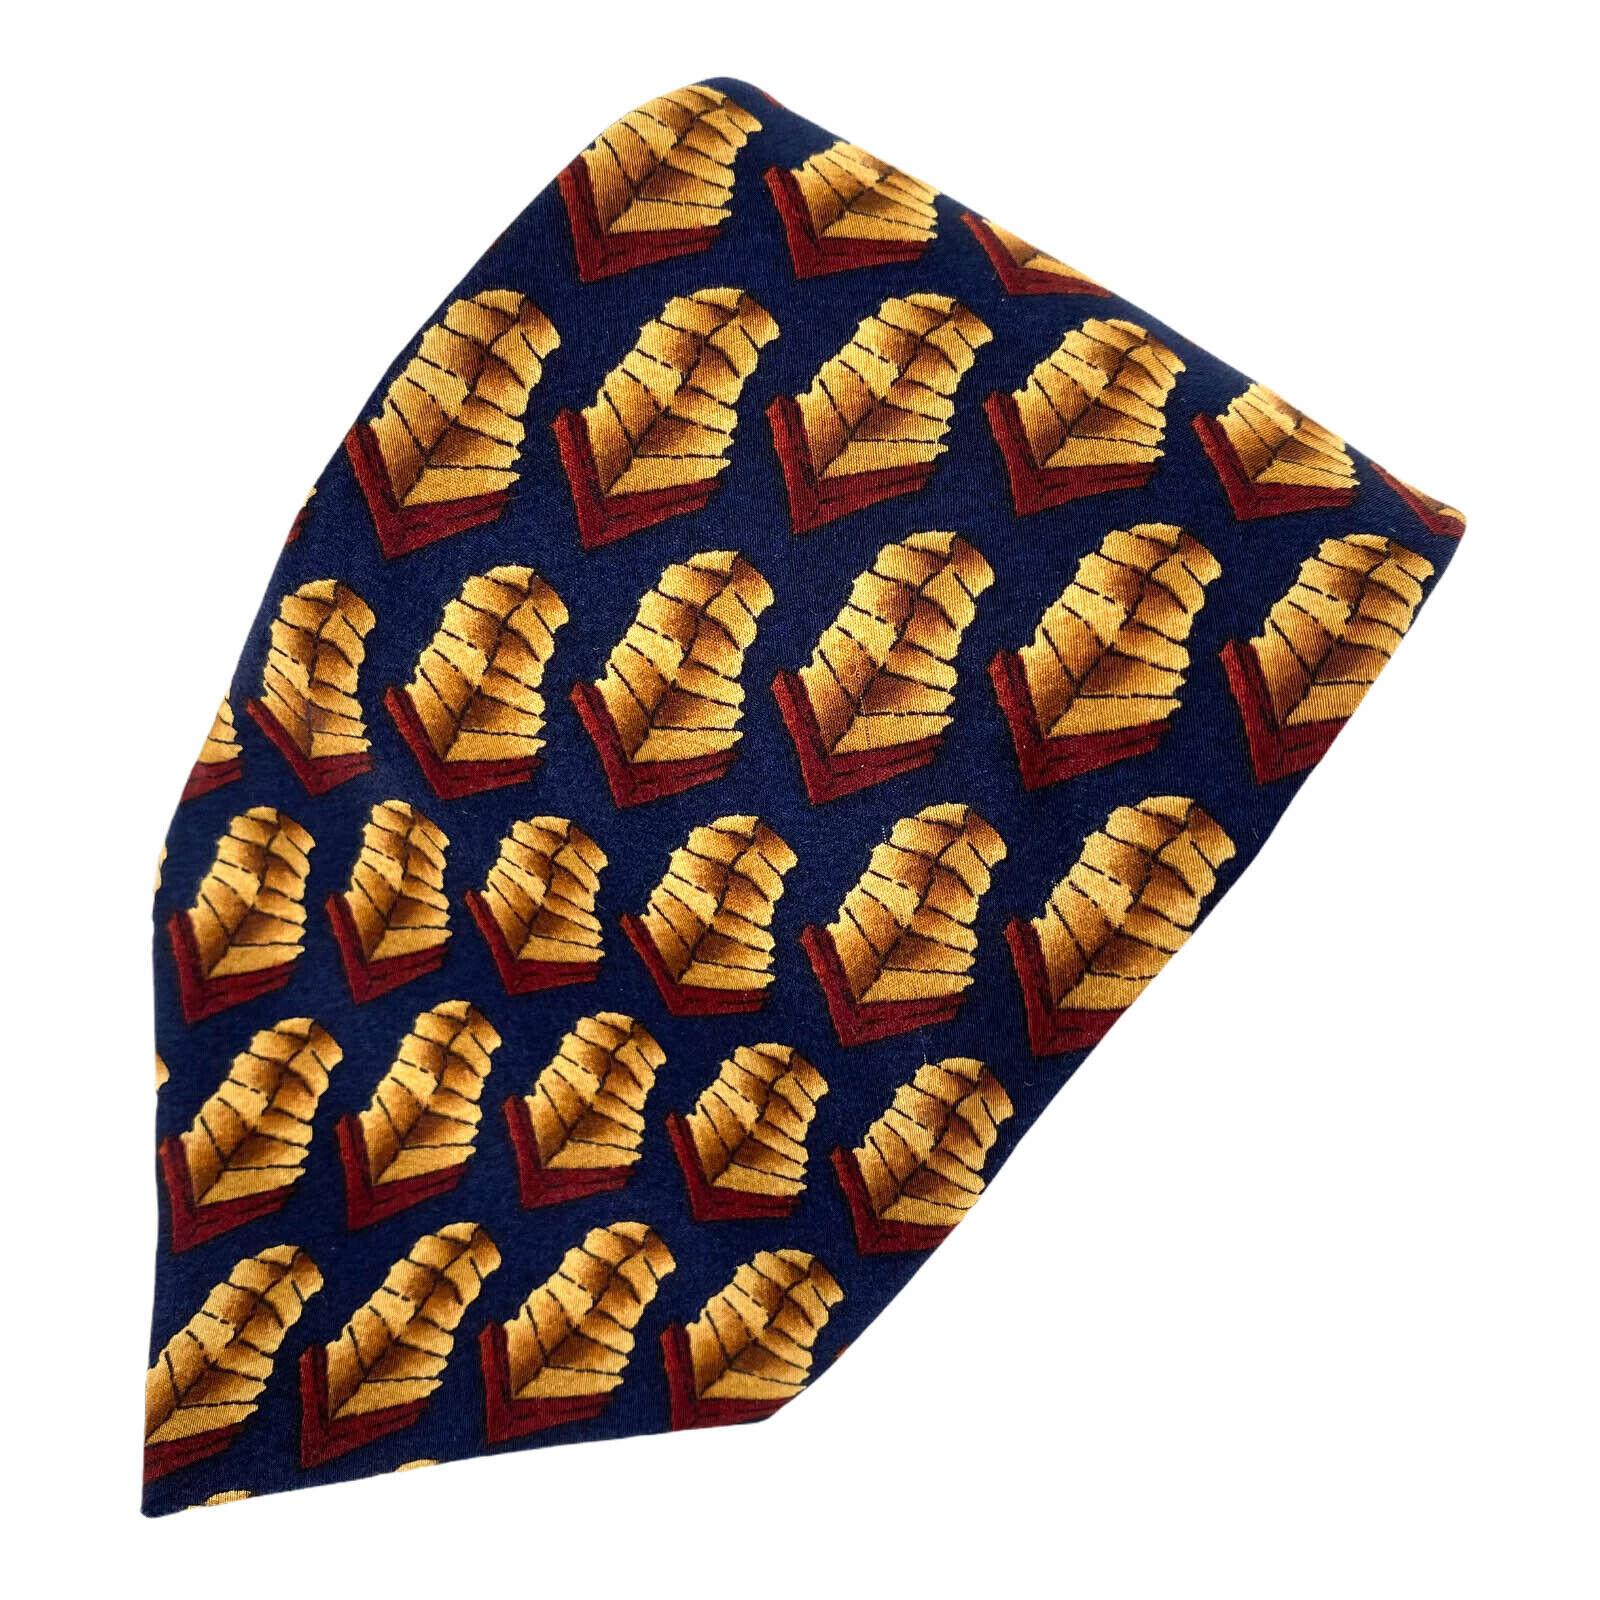 J.Garcia Pfeile Schutzschild Stacks Schwarz Gold Rot-Braun Seide Krawatte